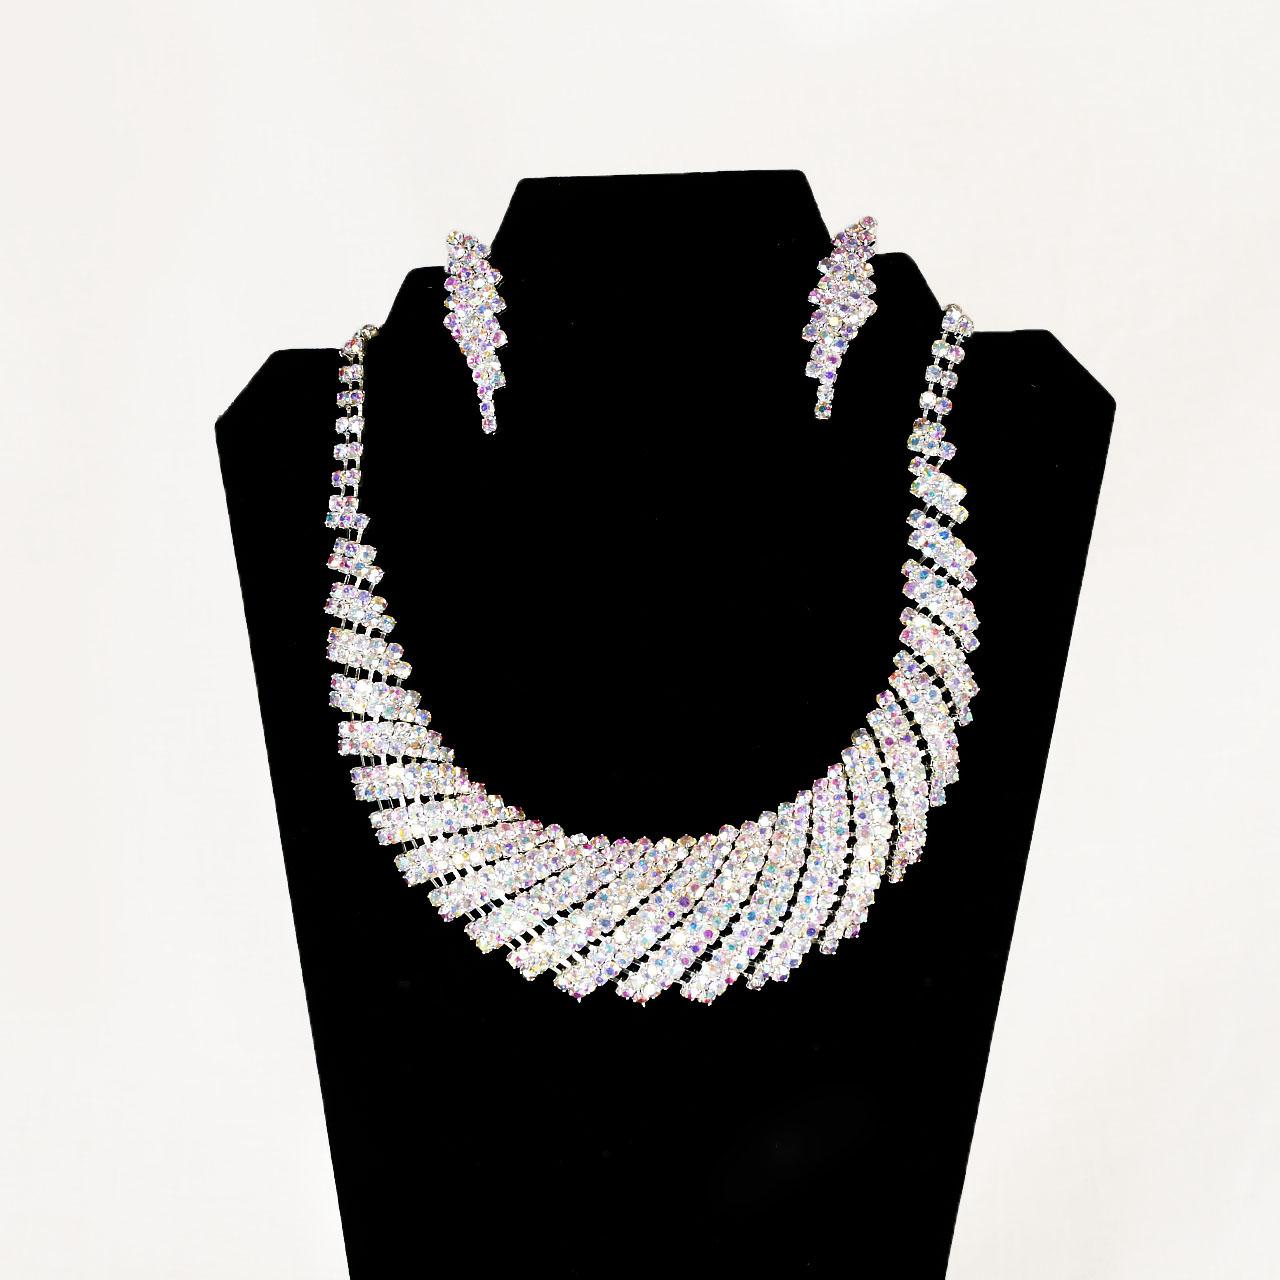 Iridescent Crystal Jewelry